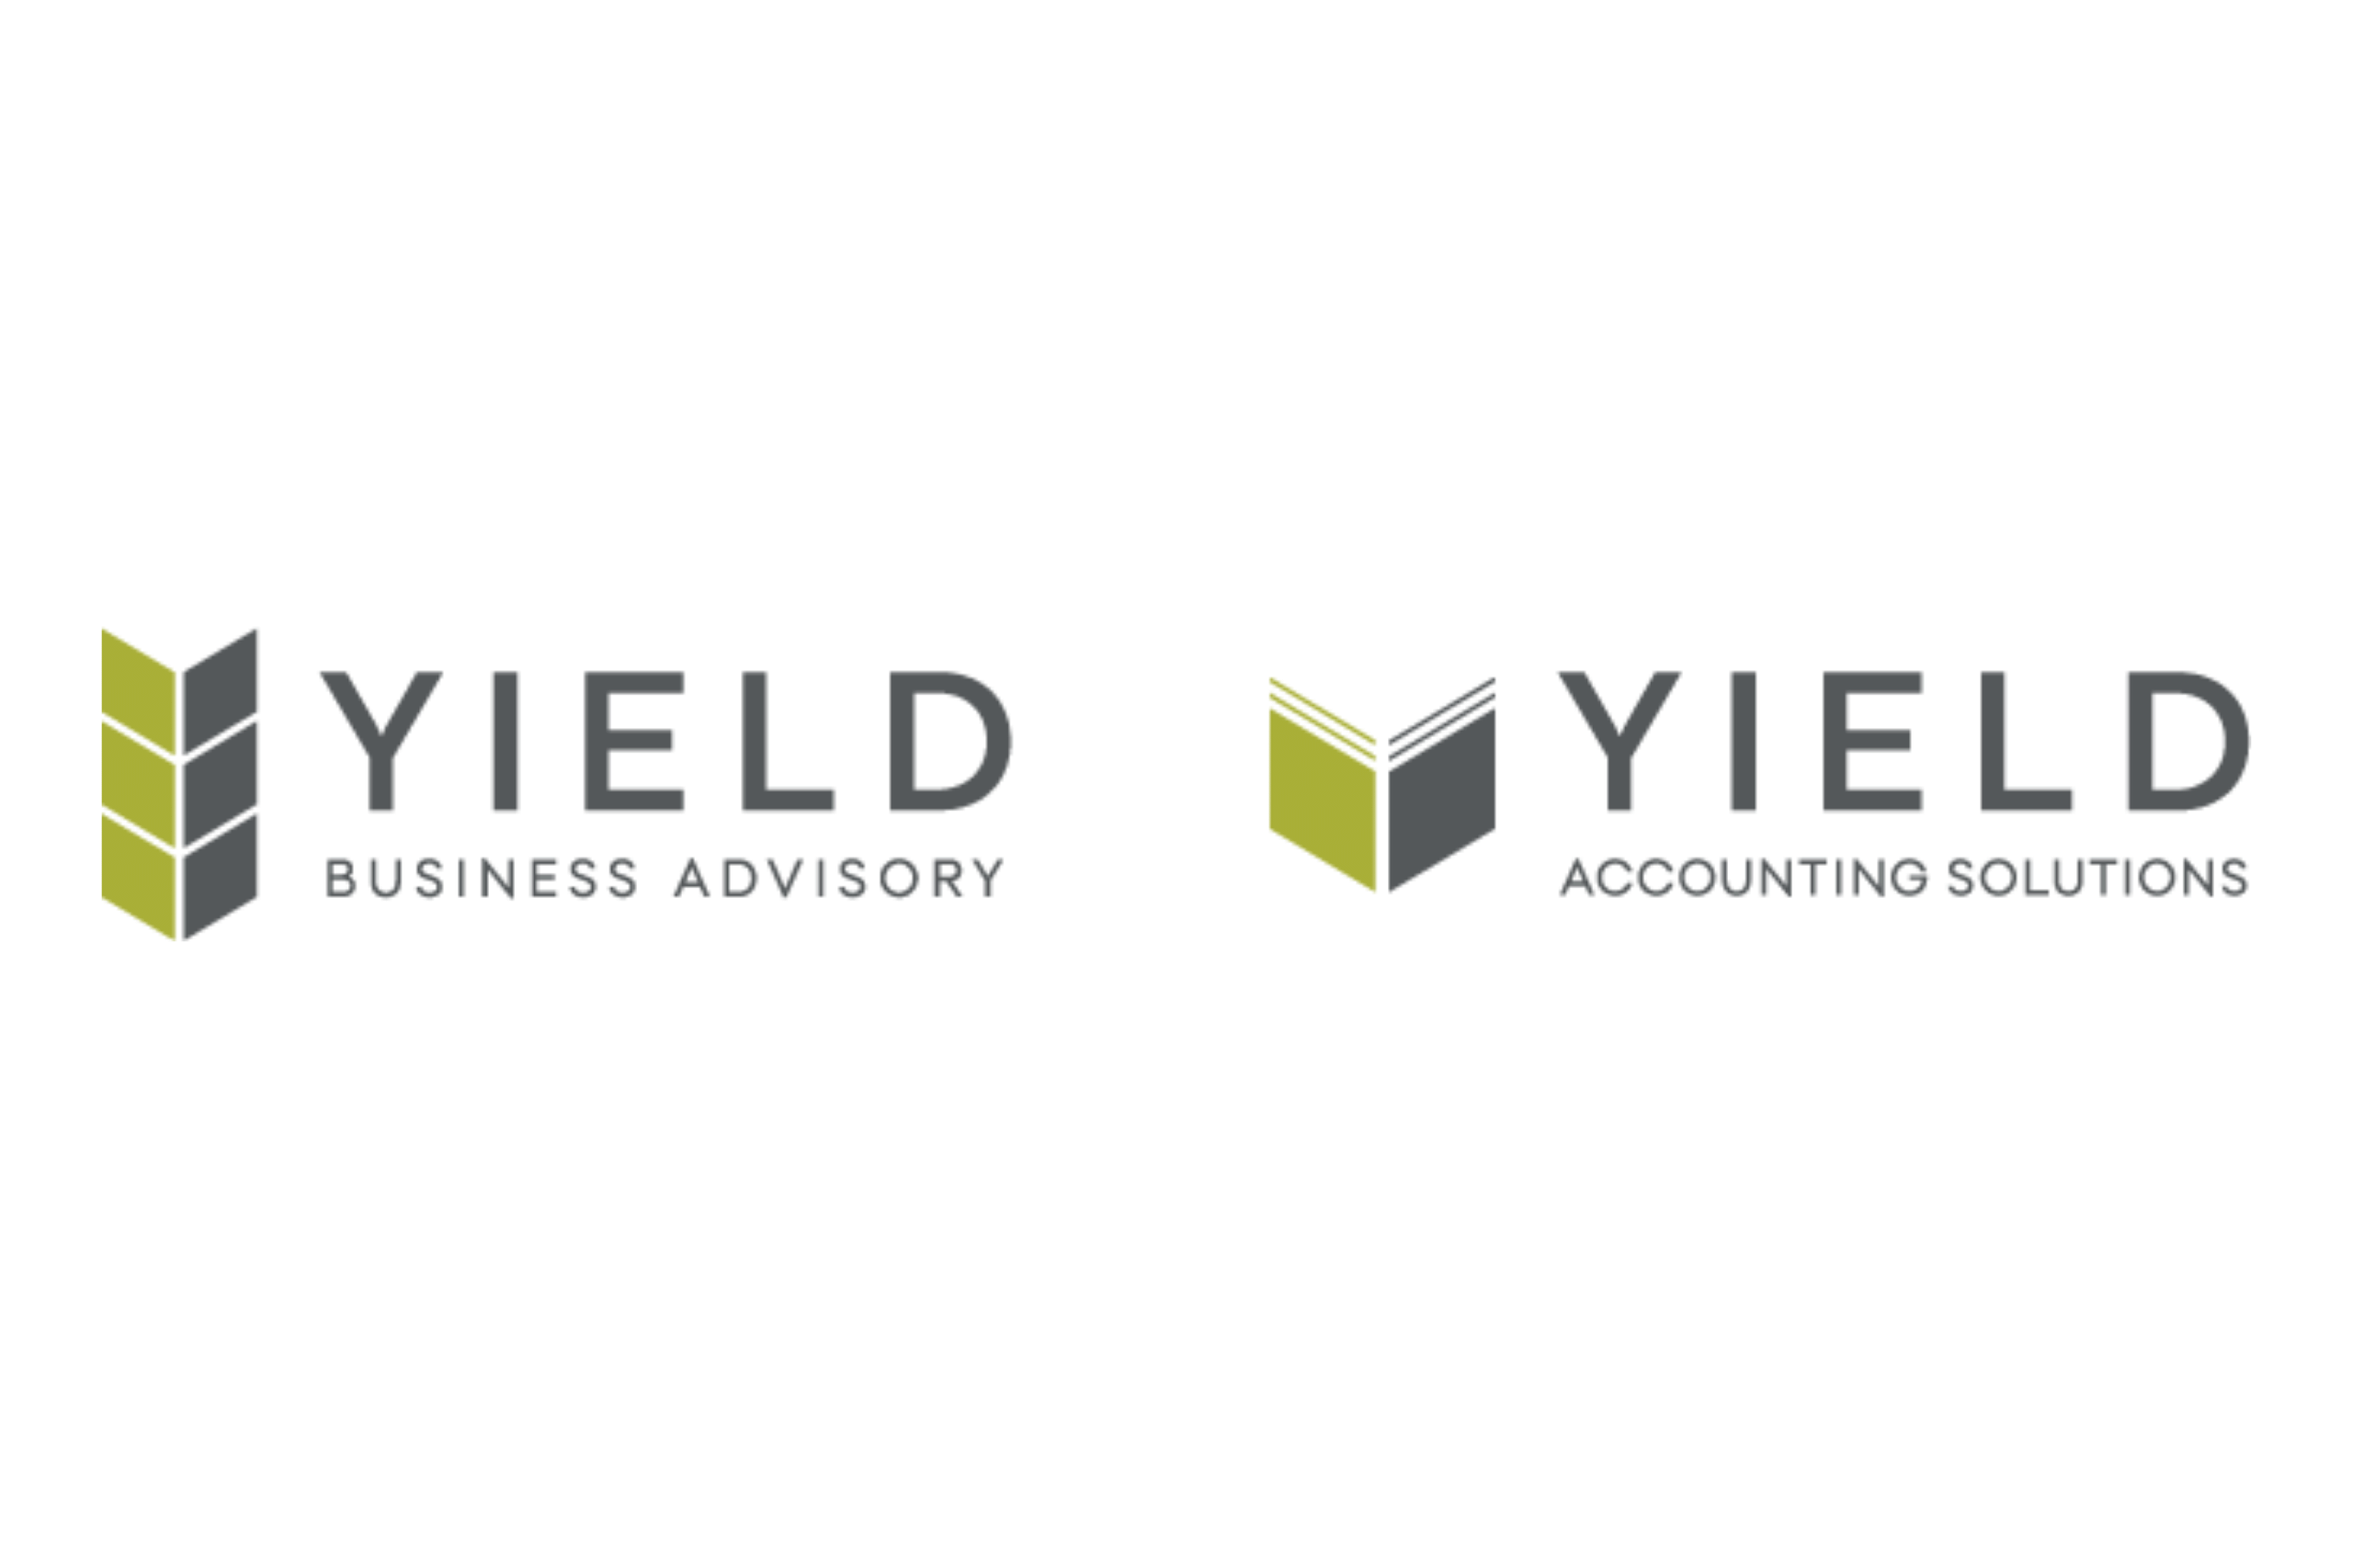 Introducing YIELD Business Advisory